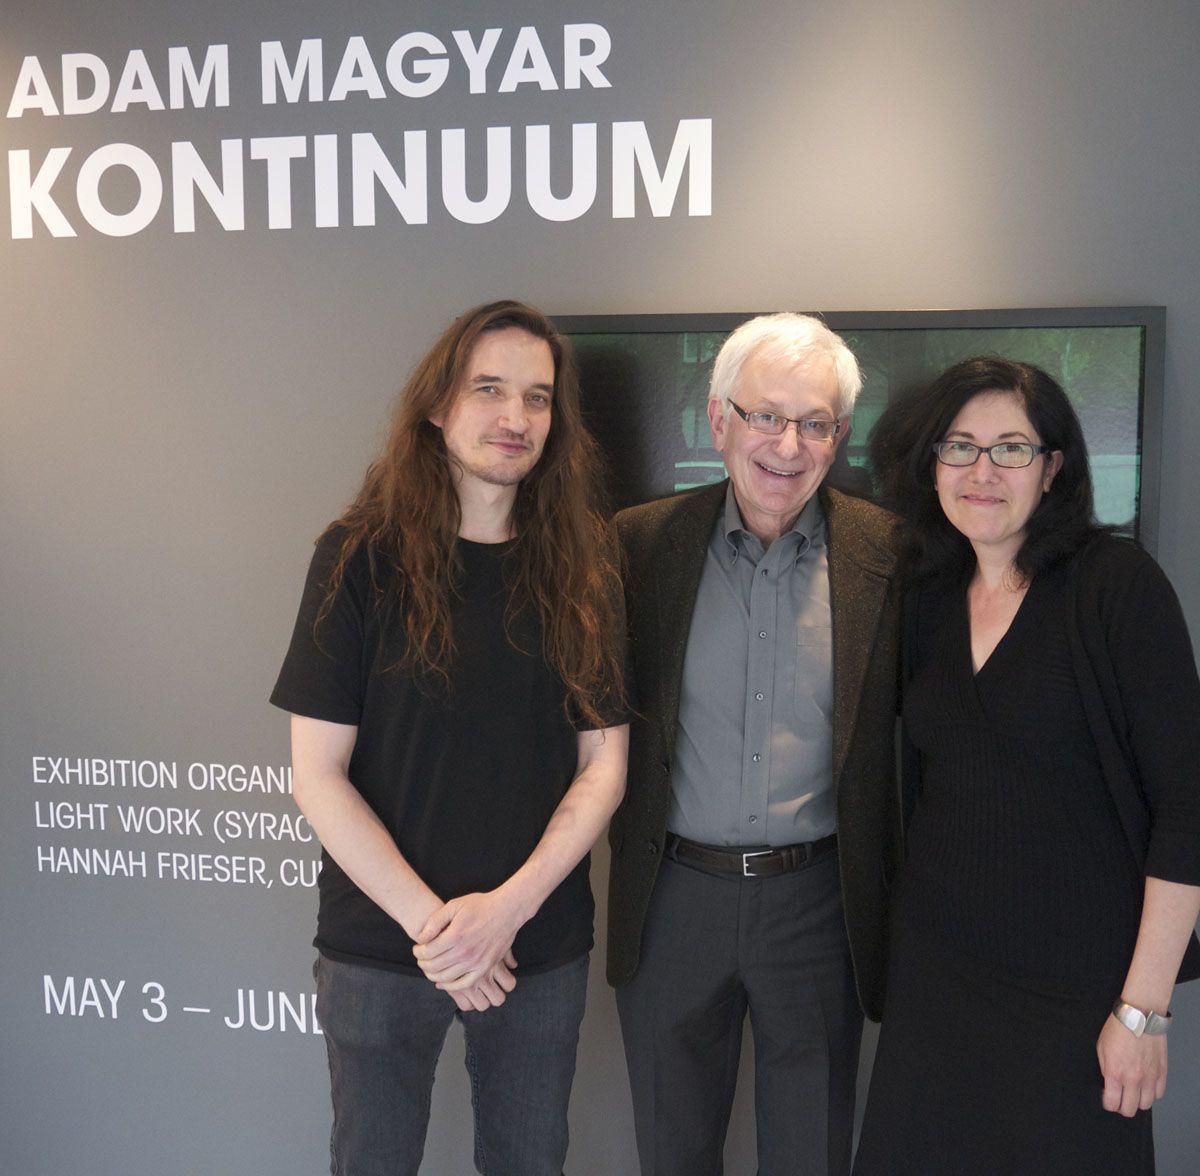 Adam Magyar, Frazier King, and Hannah Frieser at Houston